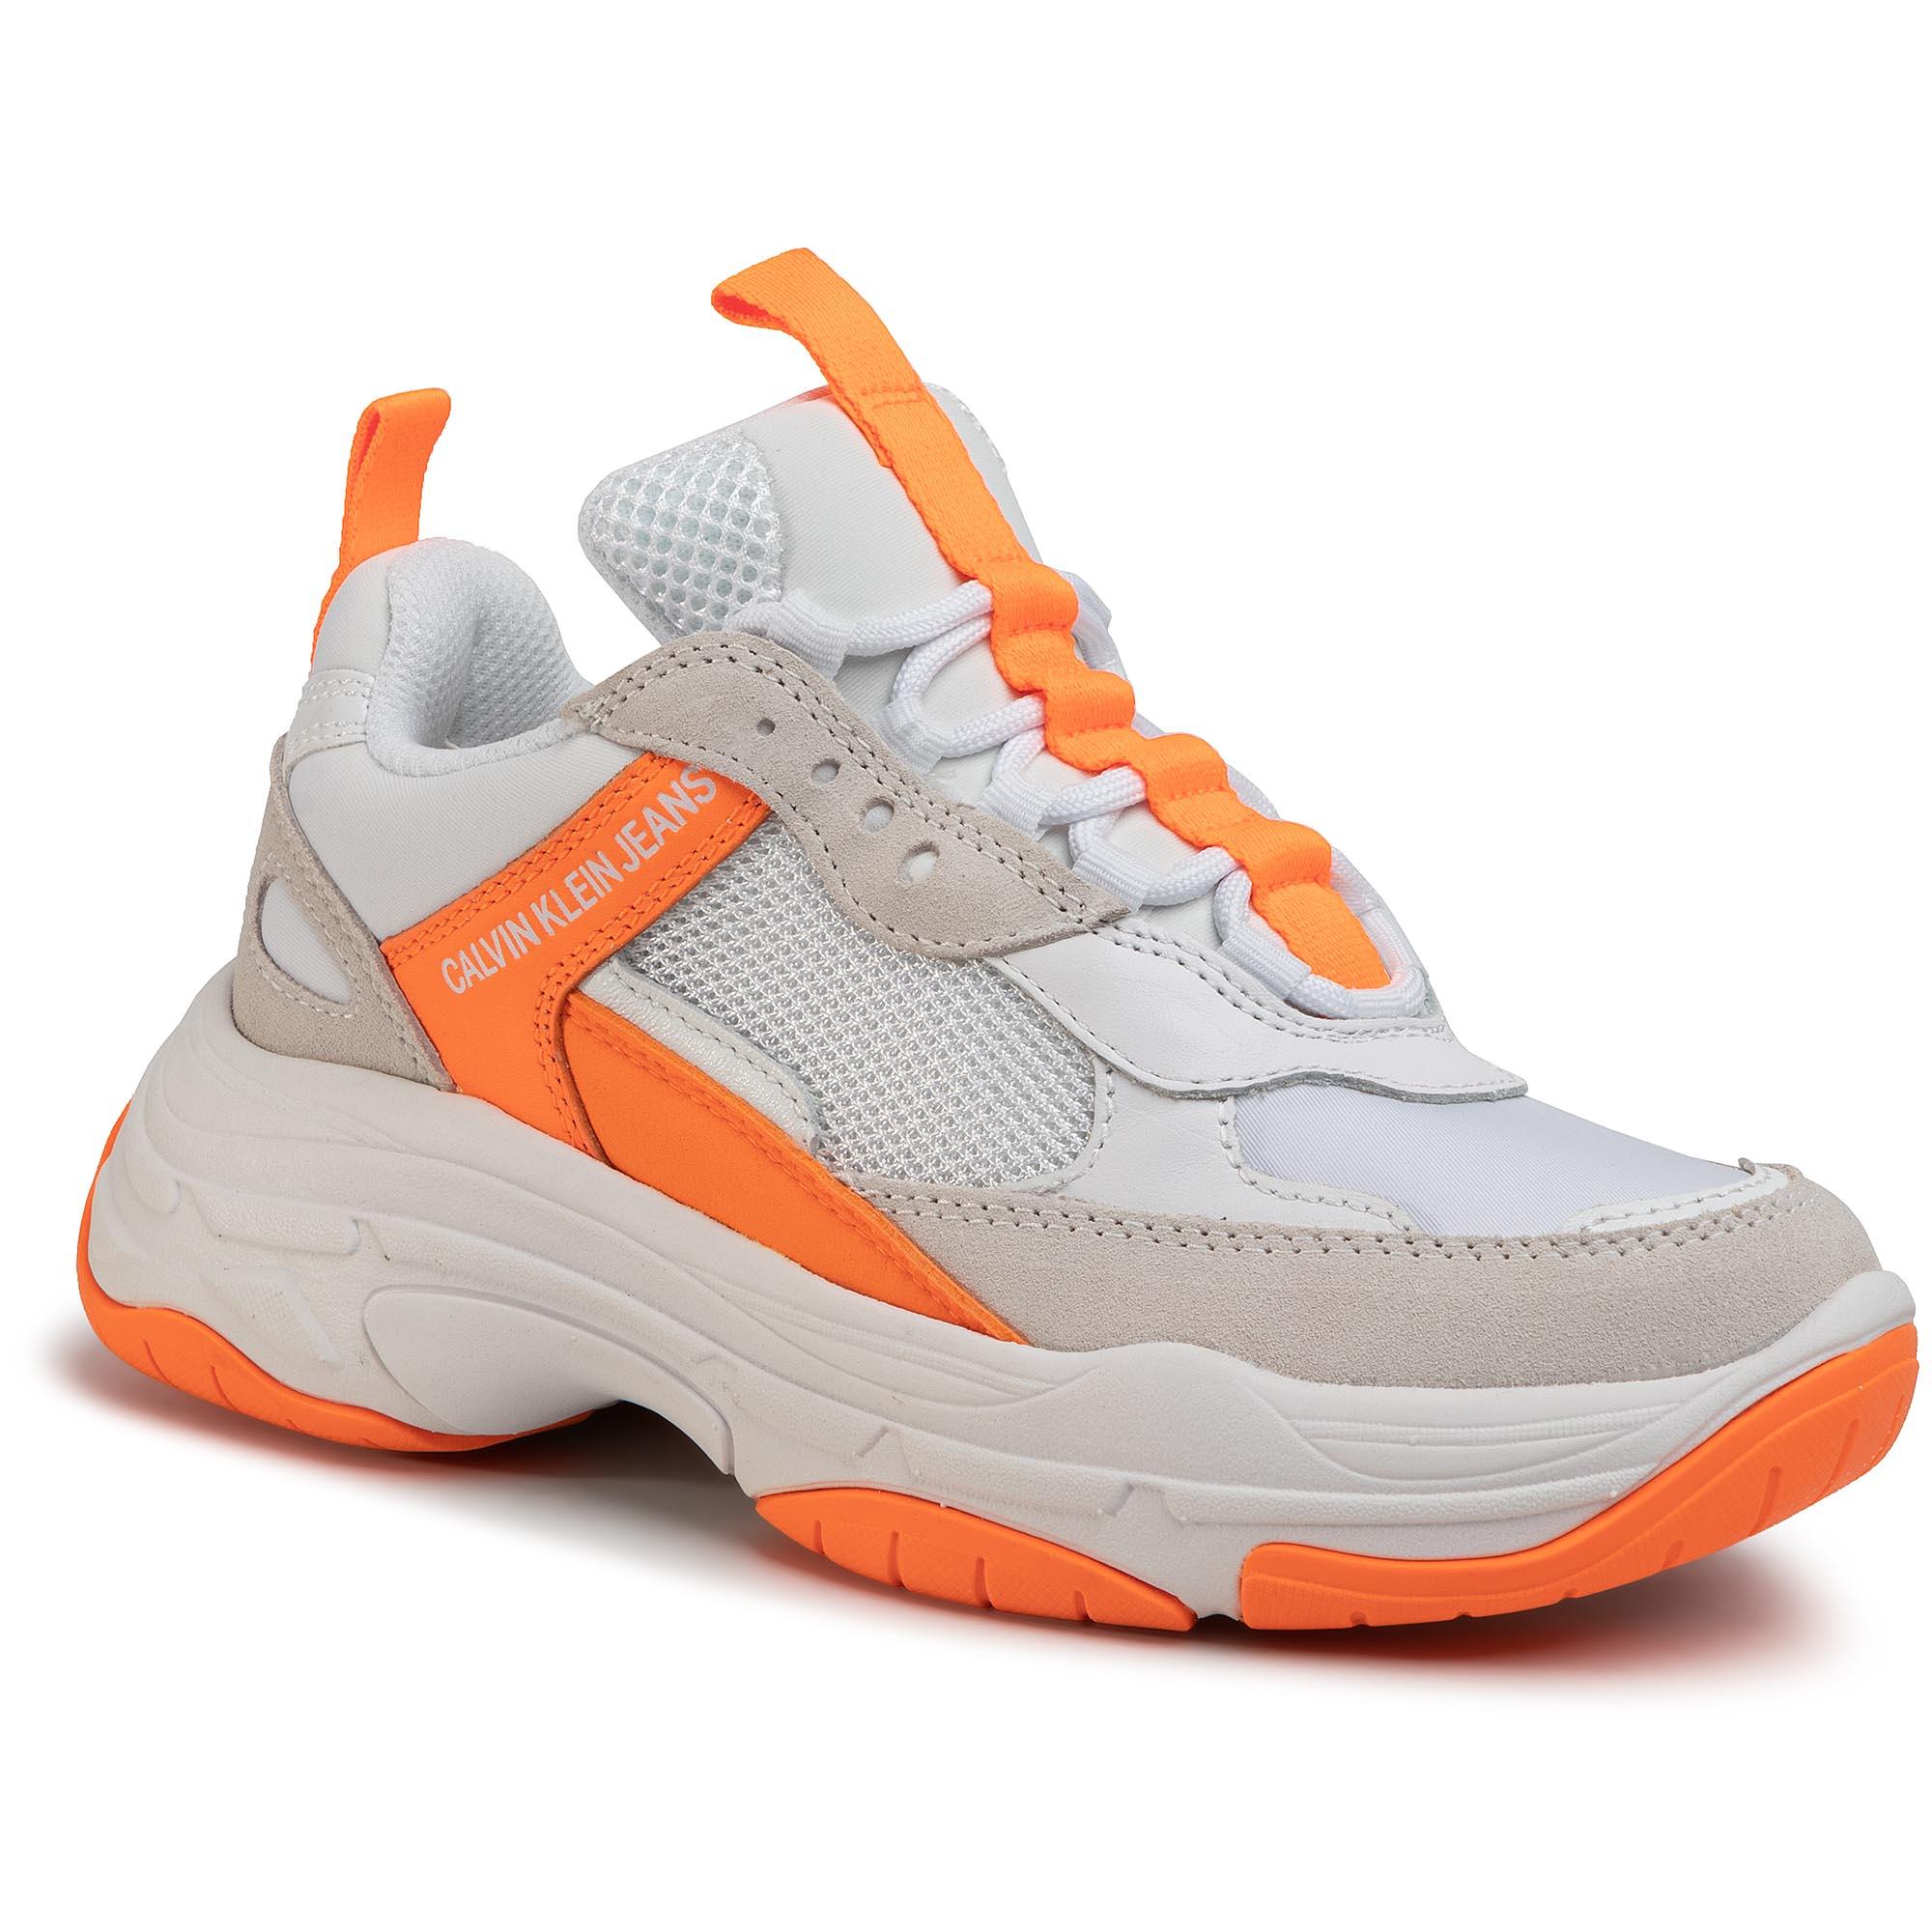 Sneakers CALVIN KLEIN JEANS - Maya R0802 White/Orange Fluo